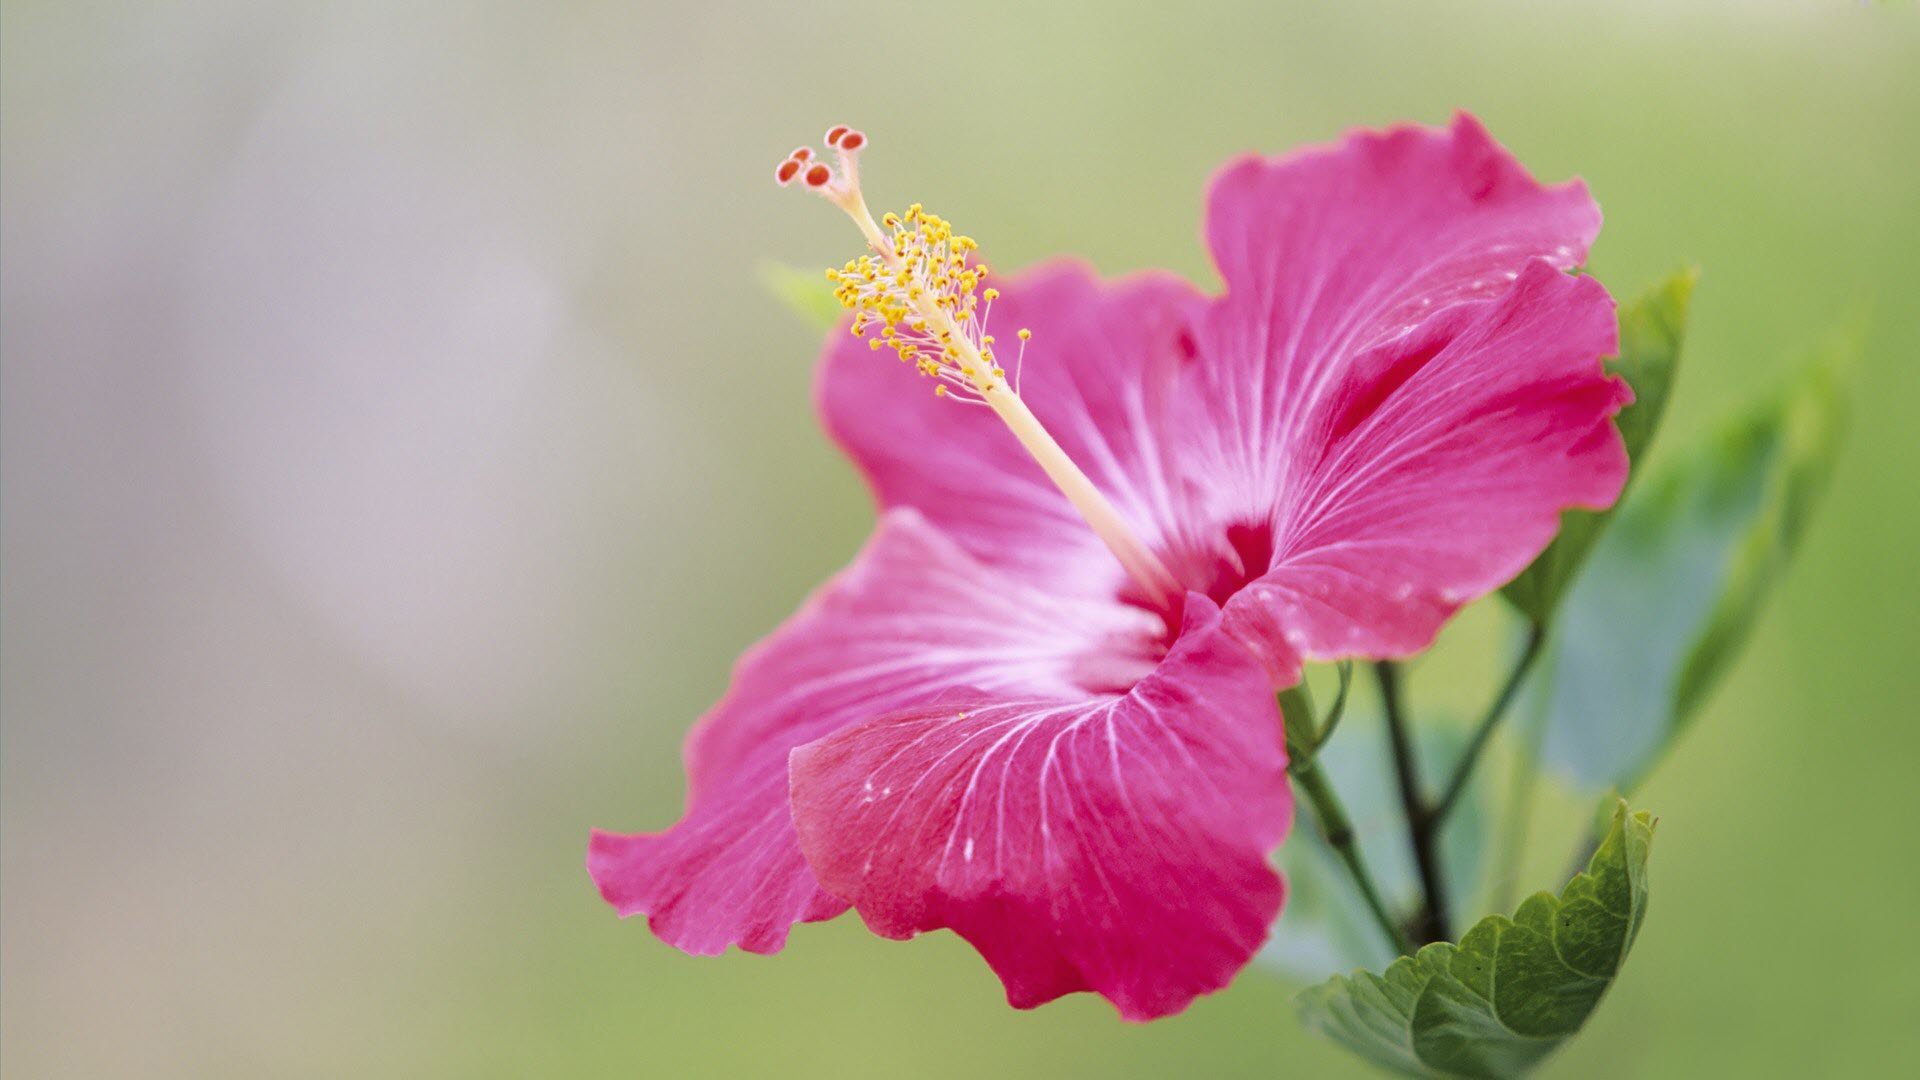 HD Wallpaper Flower Download 1920x1080